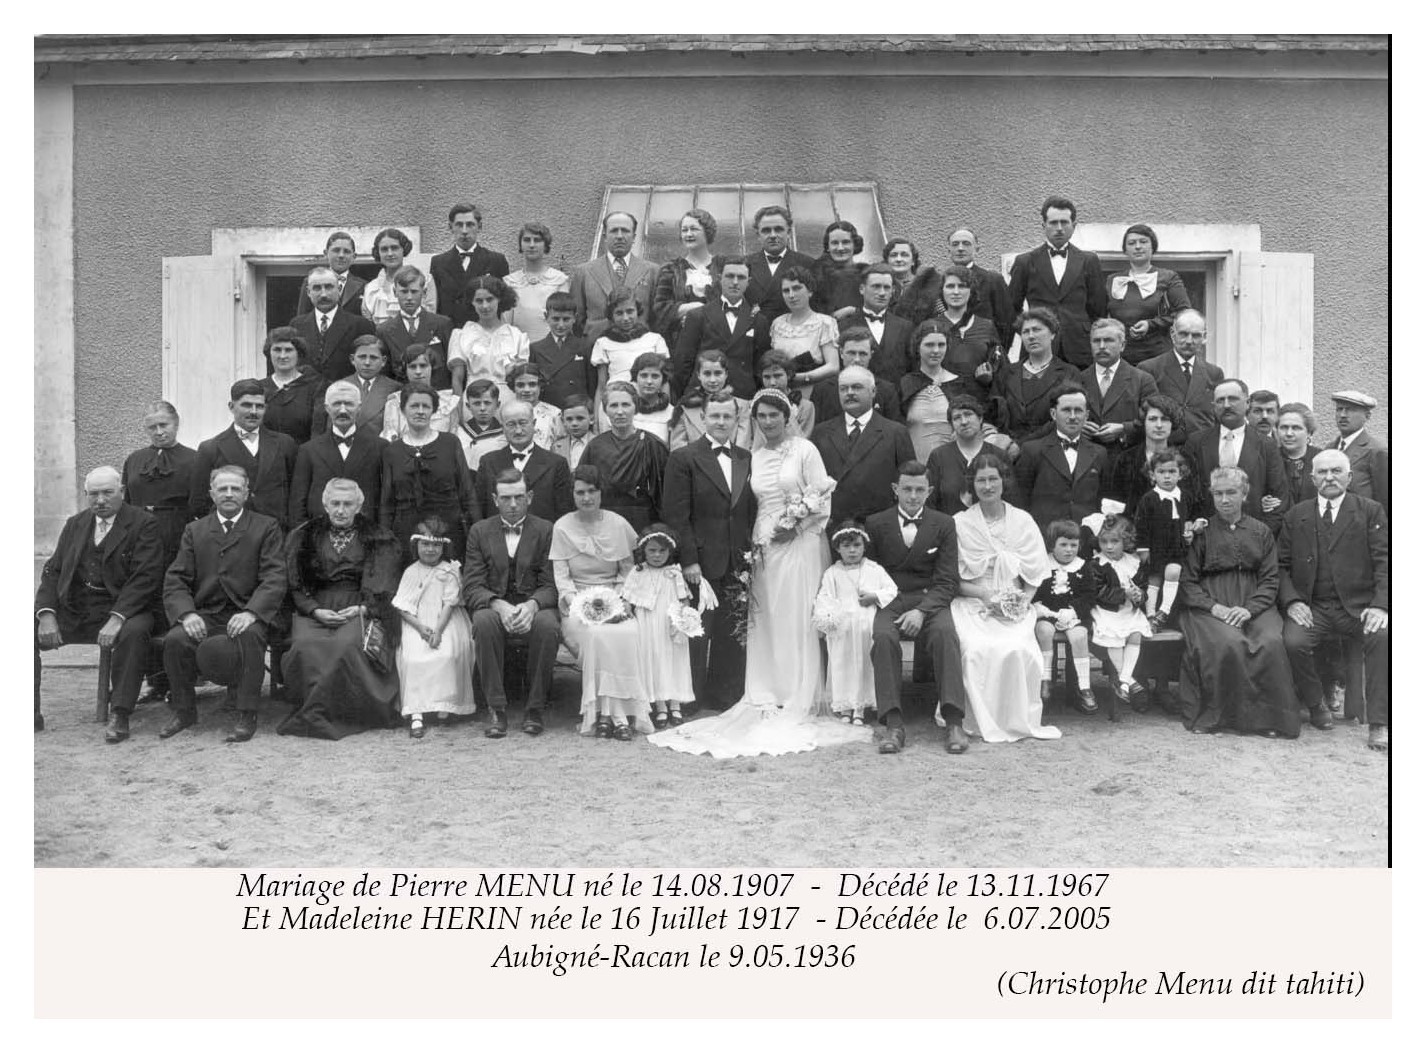 Aubigné Racan - Mariage - MENU Pierre et HERIN Madeleine - 9 mai 1936 (Christophe Menu dit Tahiti)